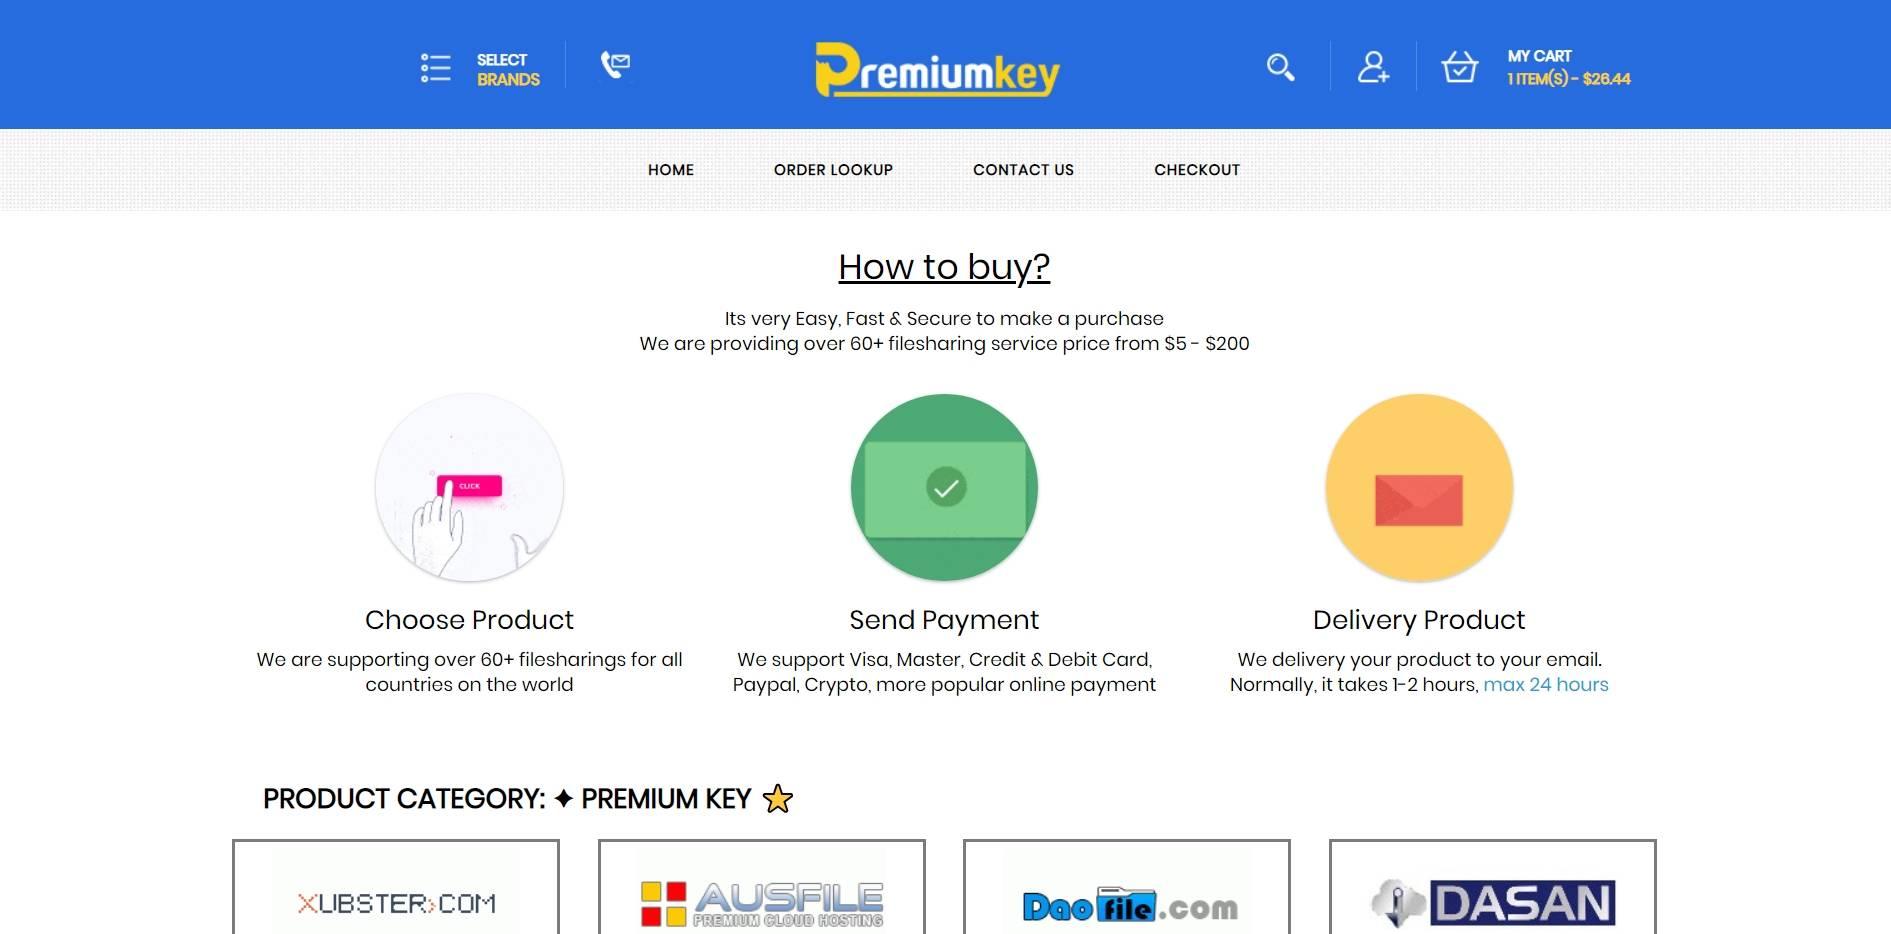 Premiumkey